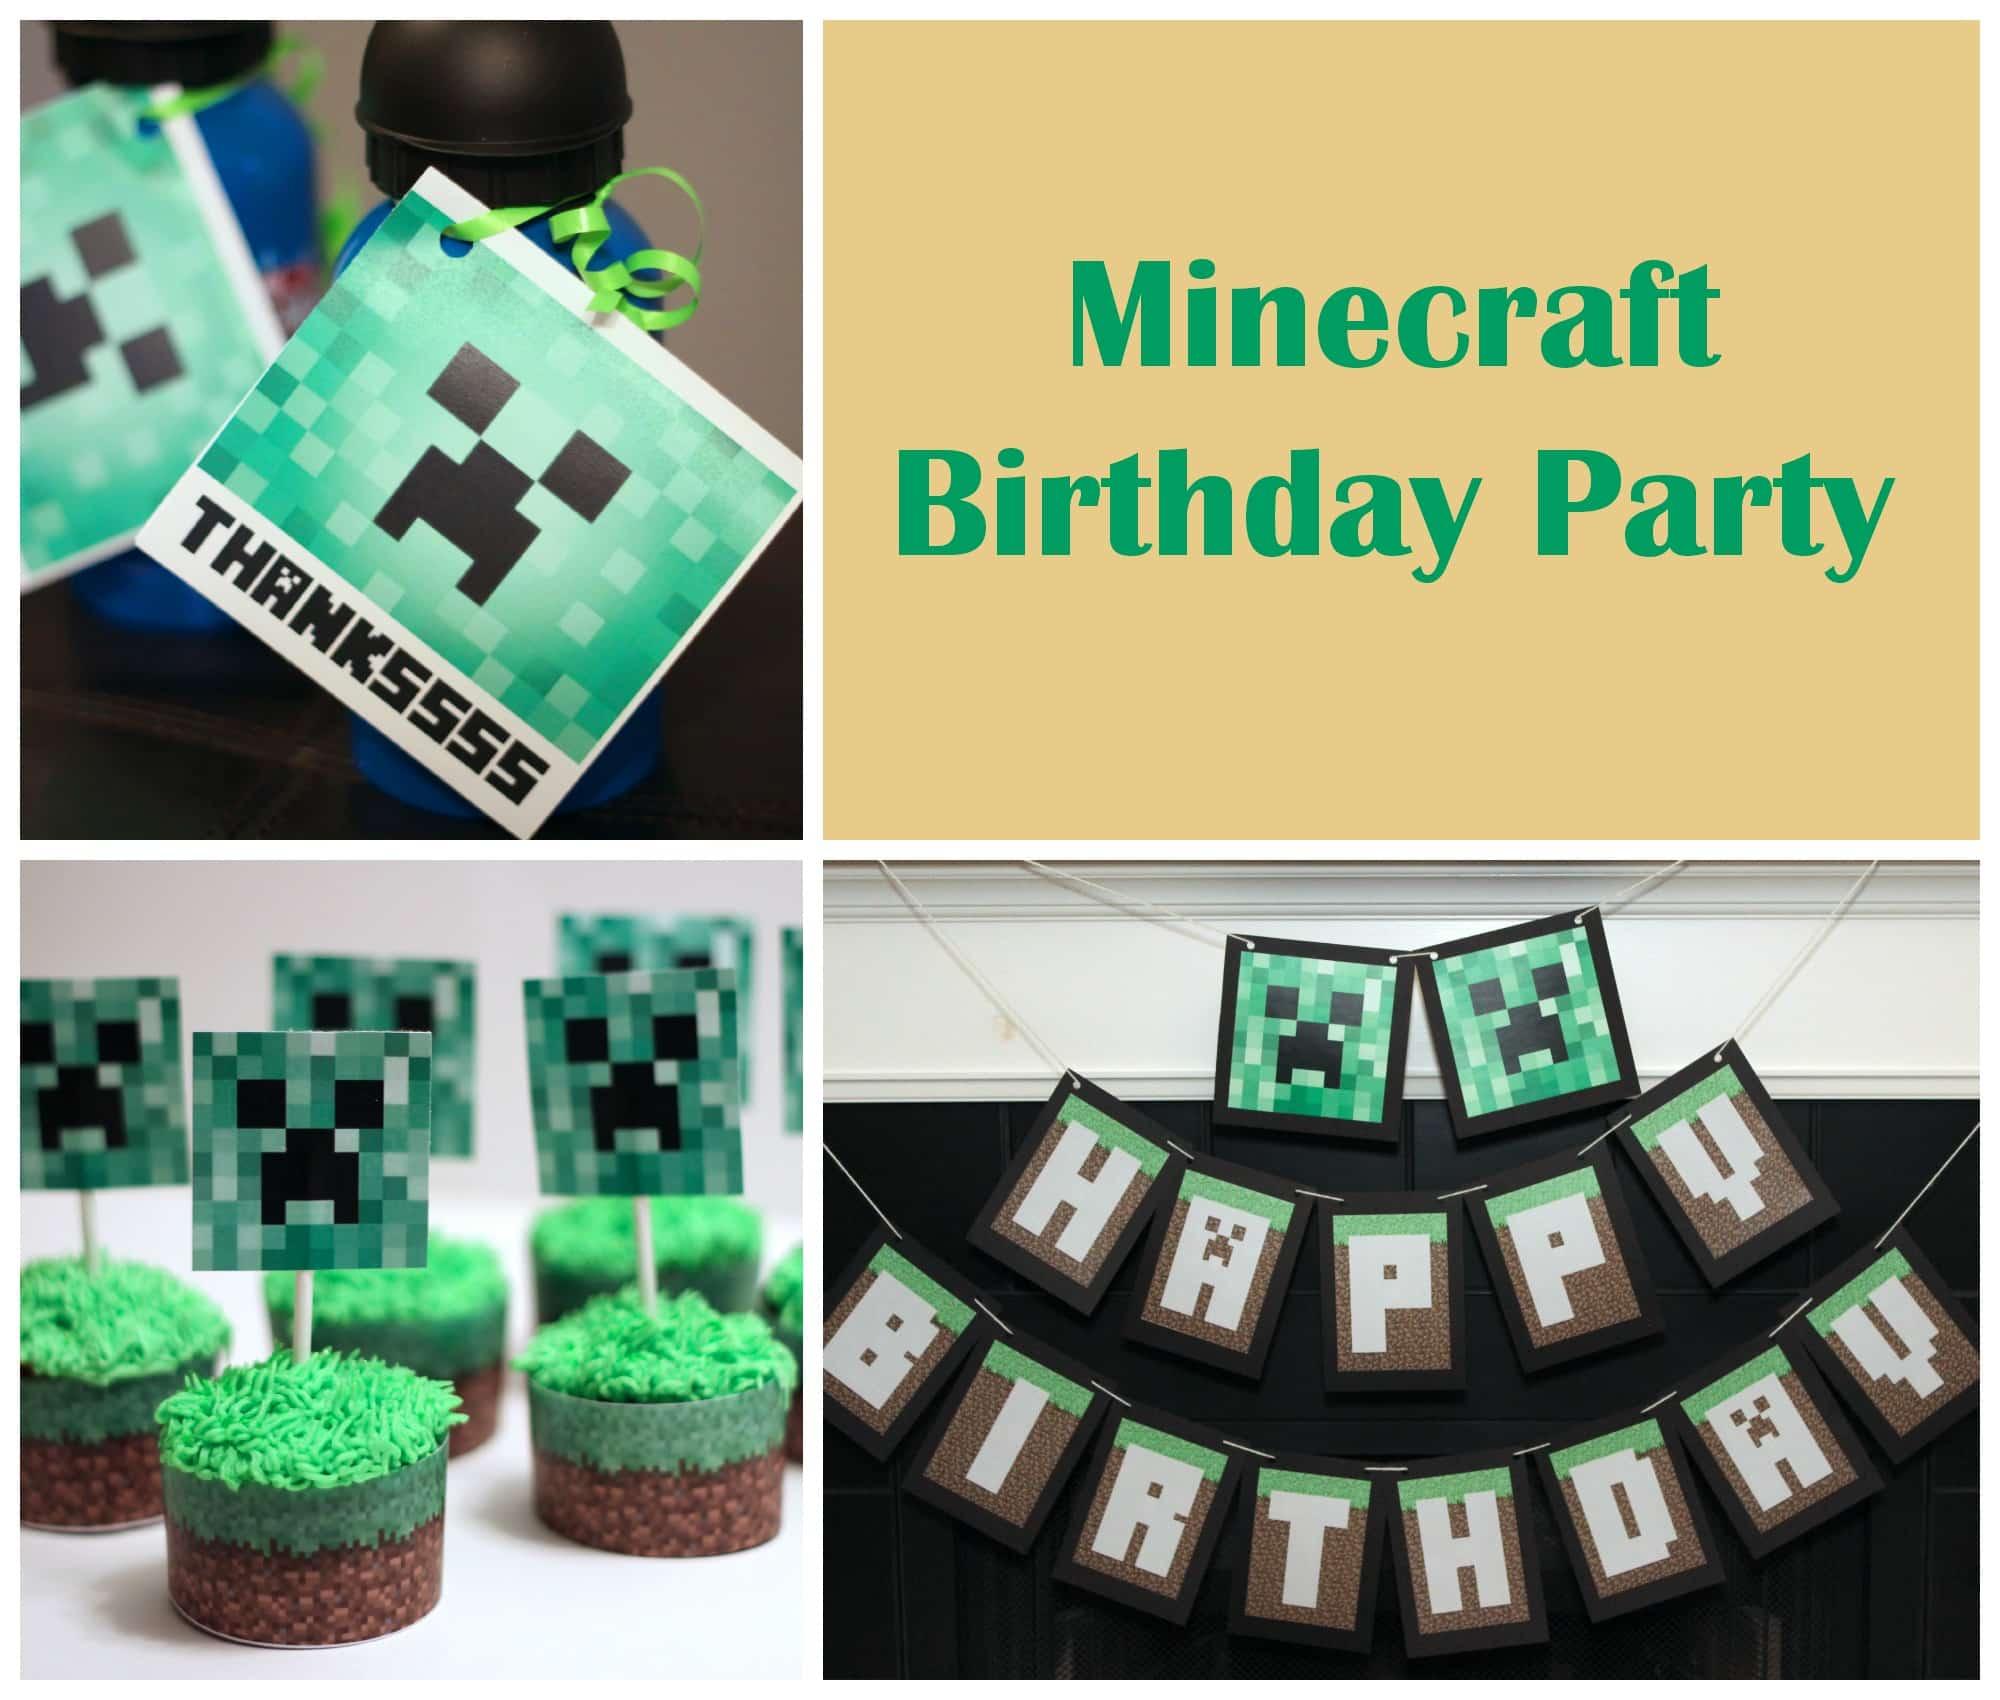 Mine craft birthday ideas - Minecraft Birthday